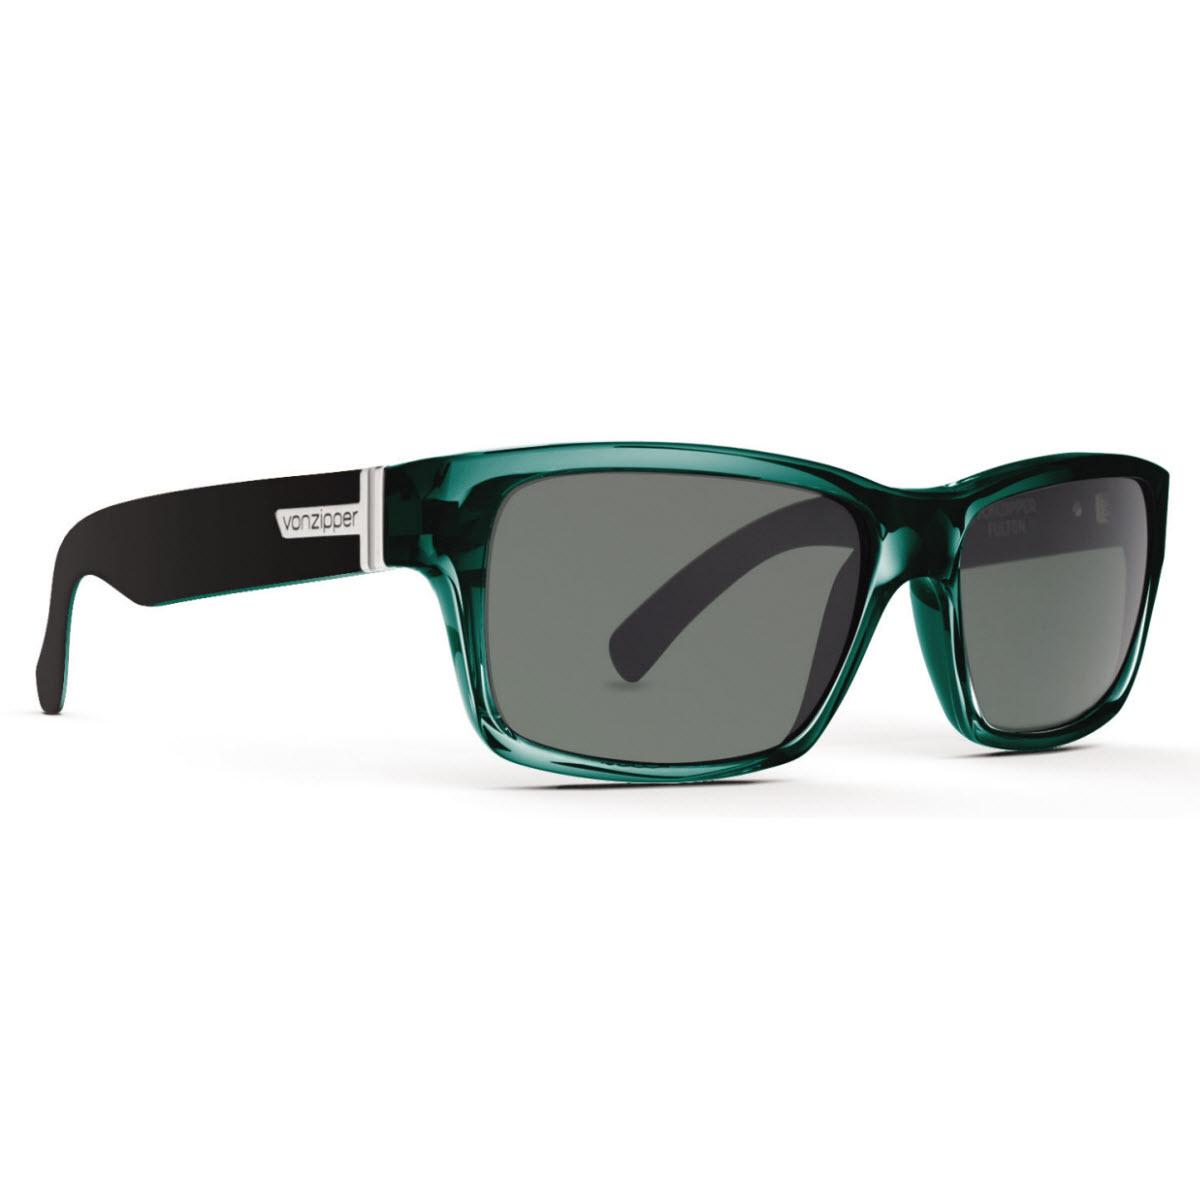 c2d49e9883 Von Zipper VZ Fulton Sunglasses Green Black Crystal with Grey Lens ...